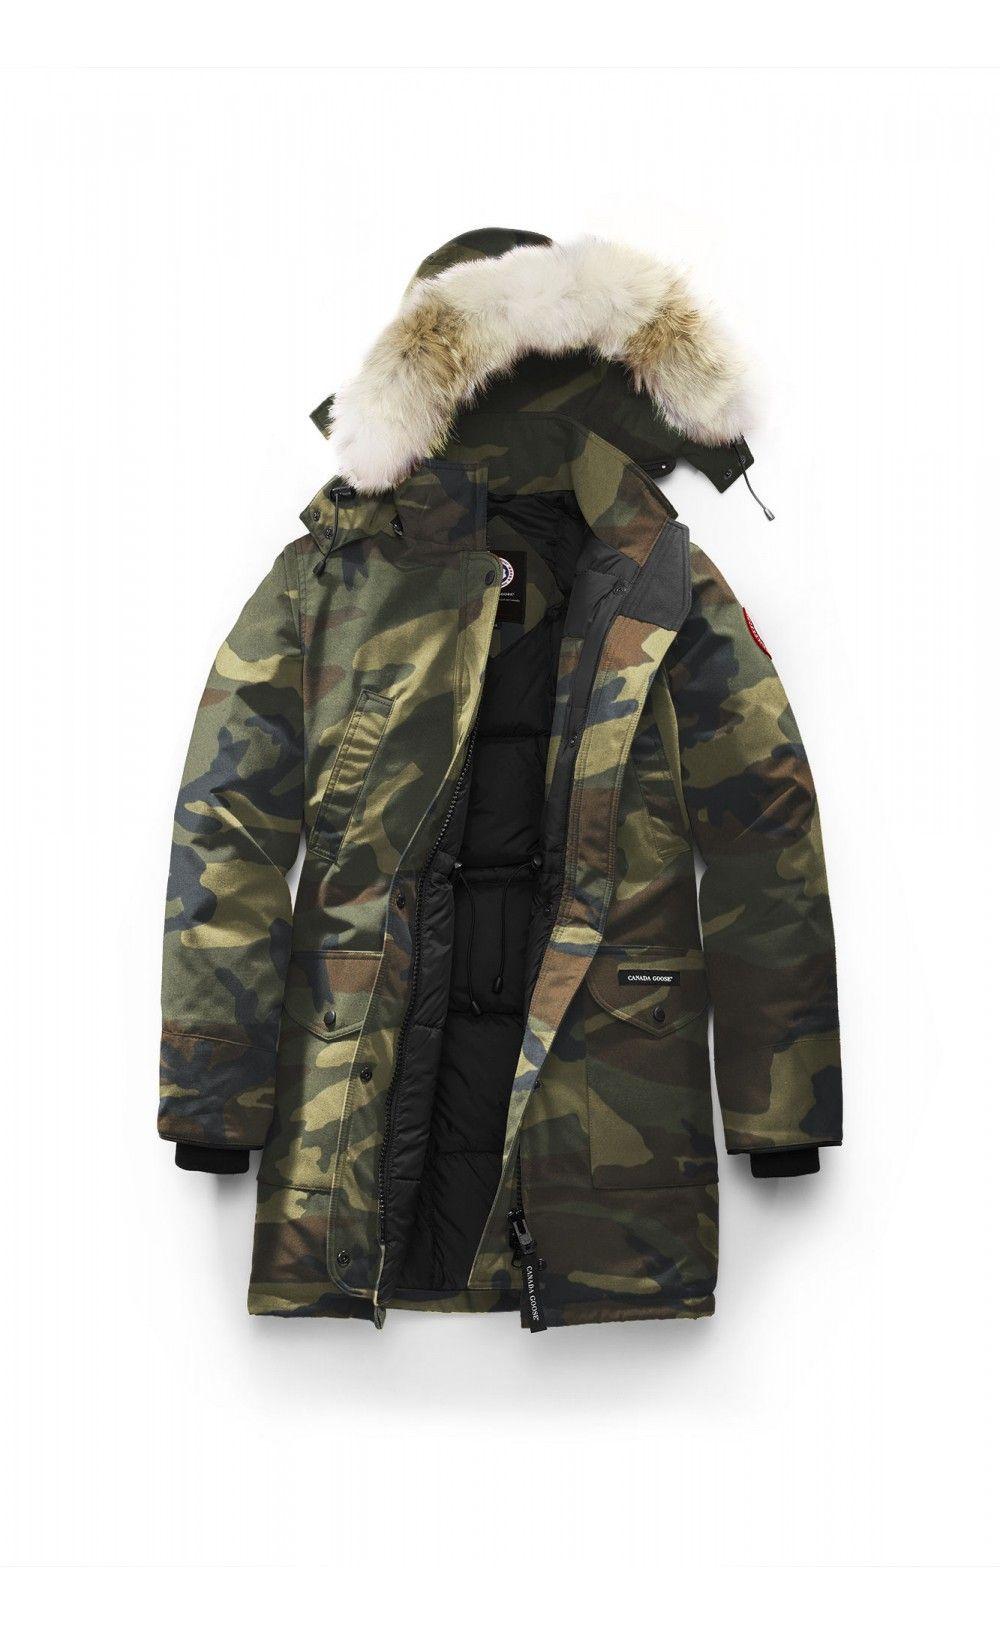 Canada Goose Trillium Parka Classic Camo Women - Canada Goose #blackfriday #fashion #parka #jacket #canadagoose #thankgivingday